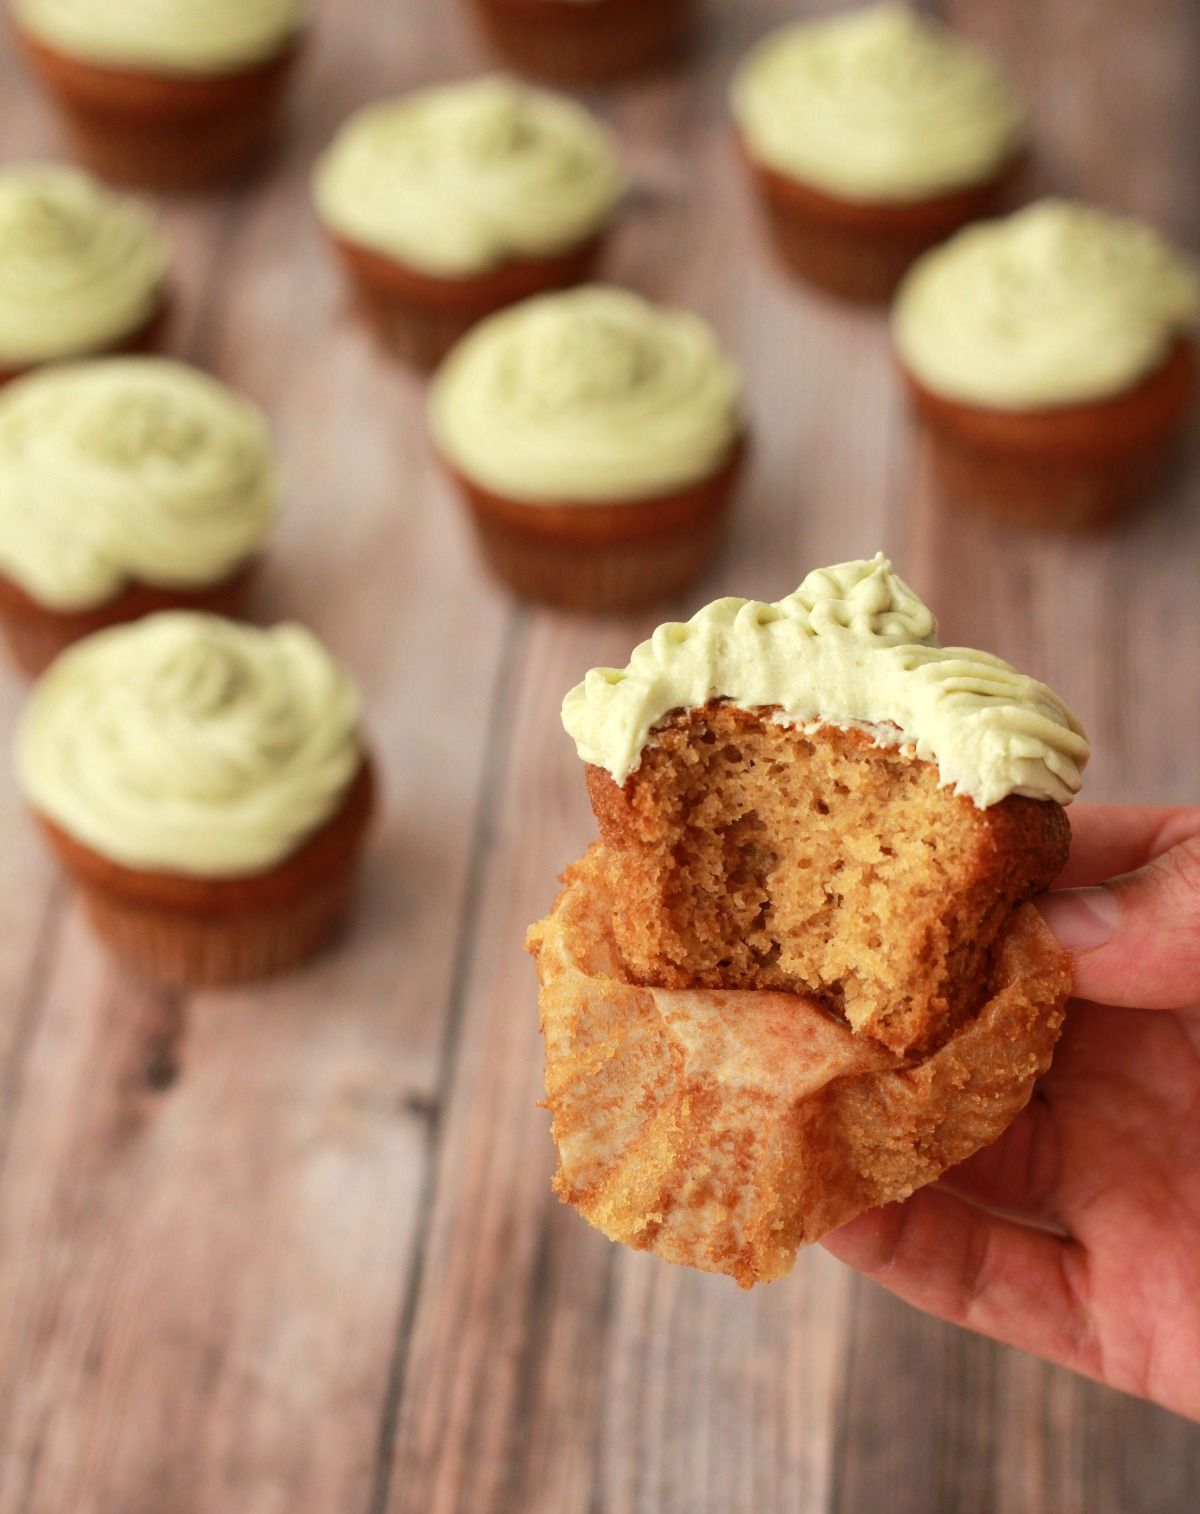 Gluten Free Vegan Vanilla Cupcakes With Matcha Green Tea Frosting Vegan Lovingitvegan Glutenfree Da Vegan Vanilla Cupcakes Gluten Free Vanilla Vegan Sweets